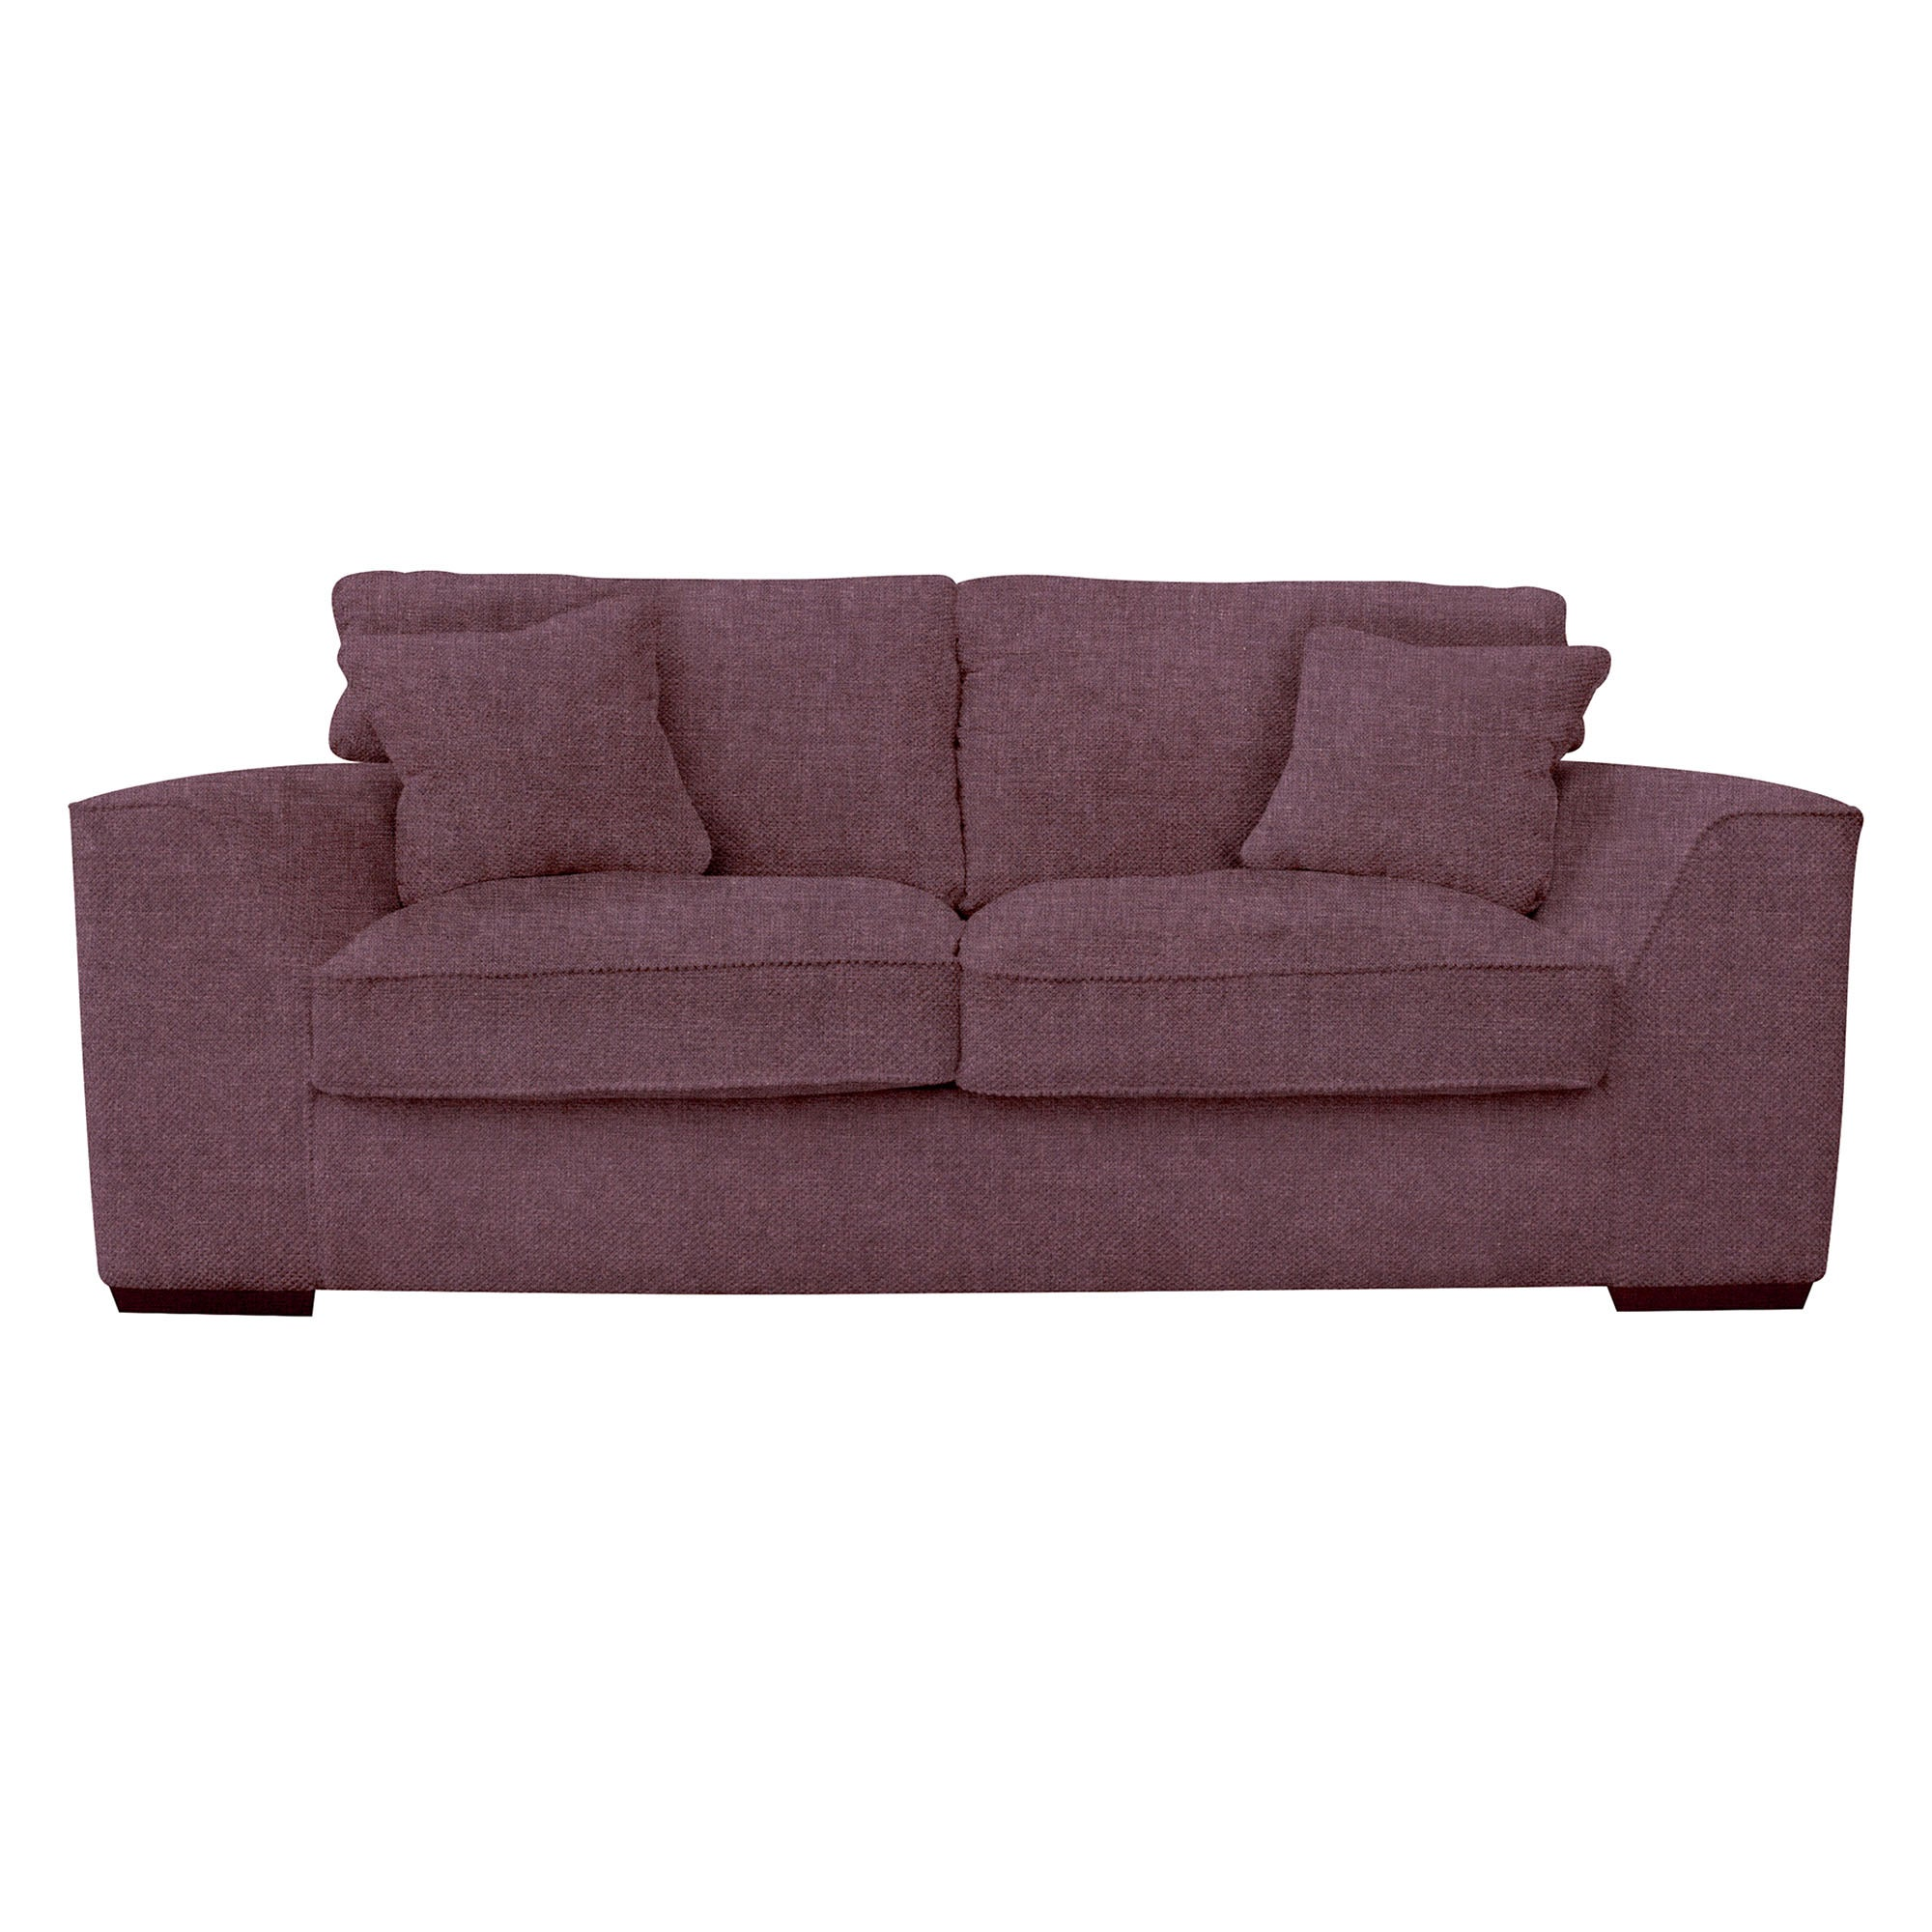 Hove Sofa